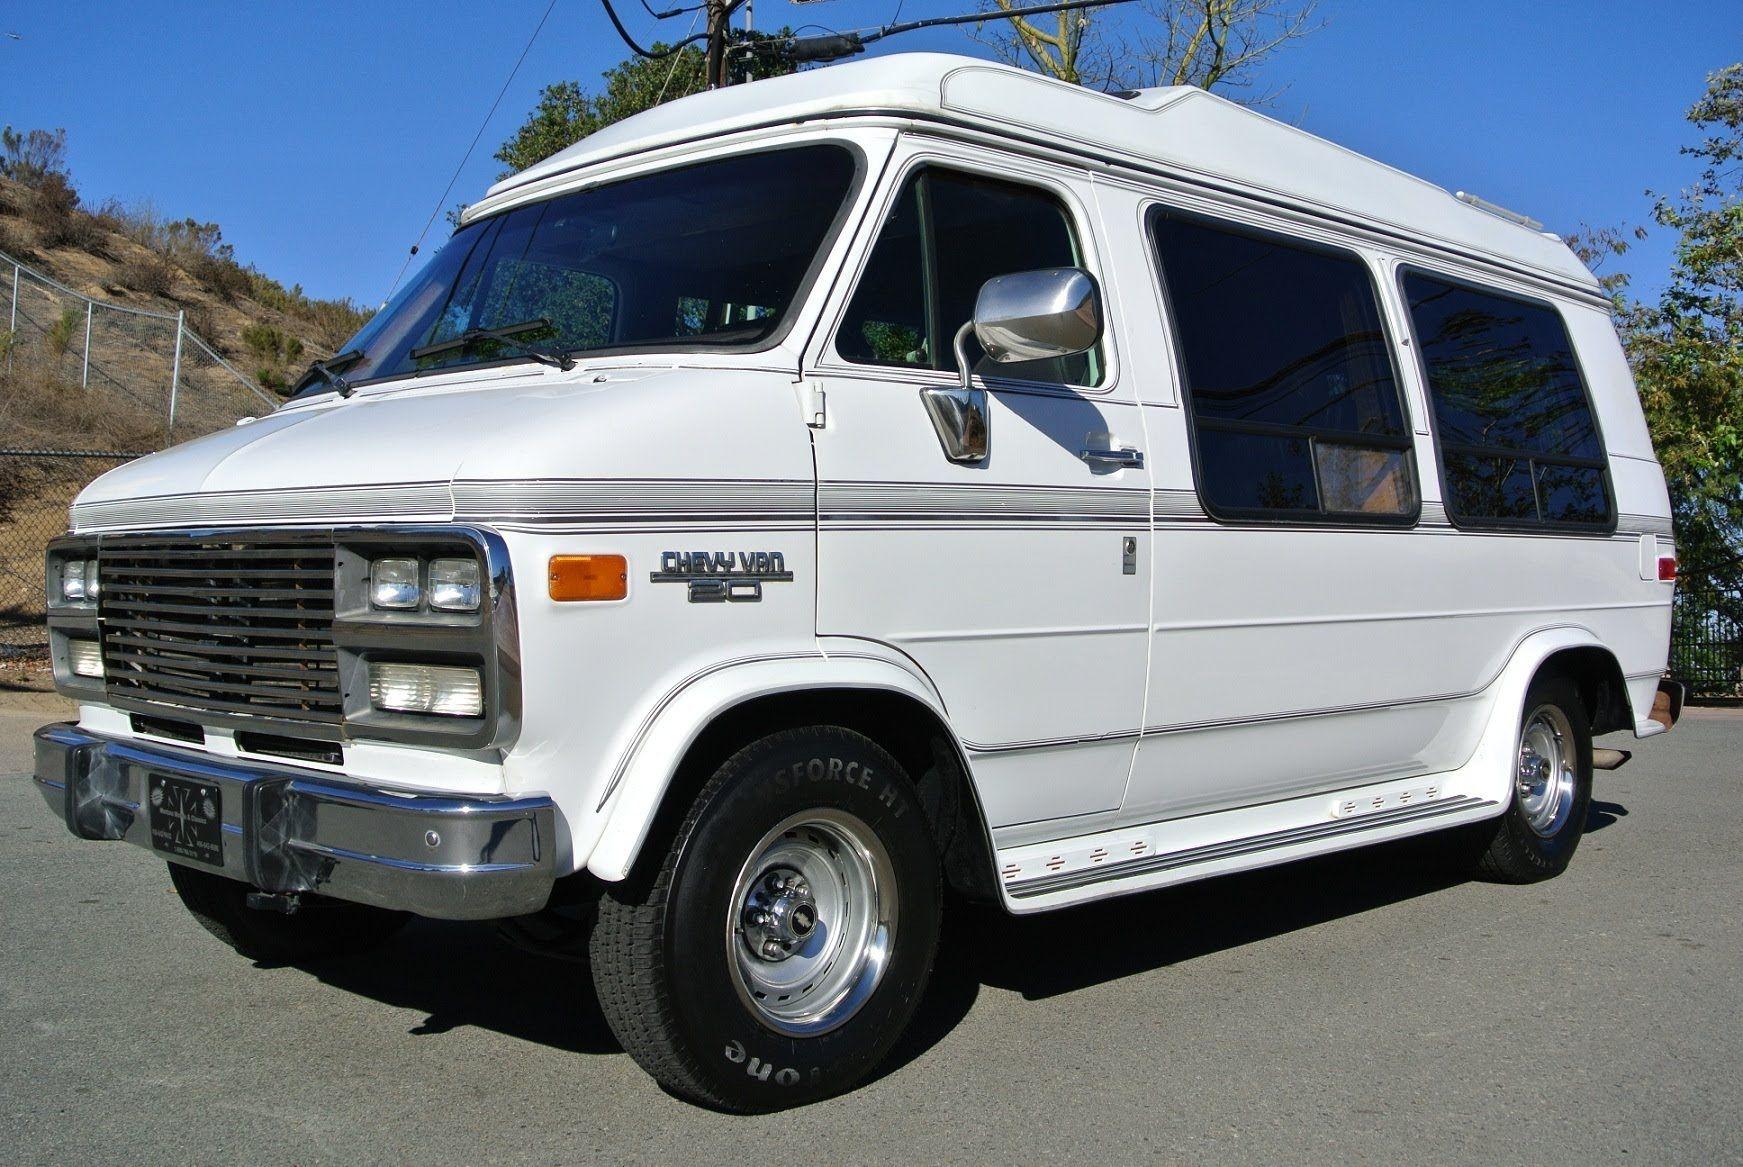 Chevrolet G20 Conversion Van Solar Mini Rv 350 Explorer W Bed Suv High Chevrolet Van Custom Camper Vans Chevy Van